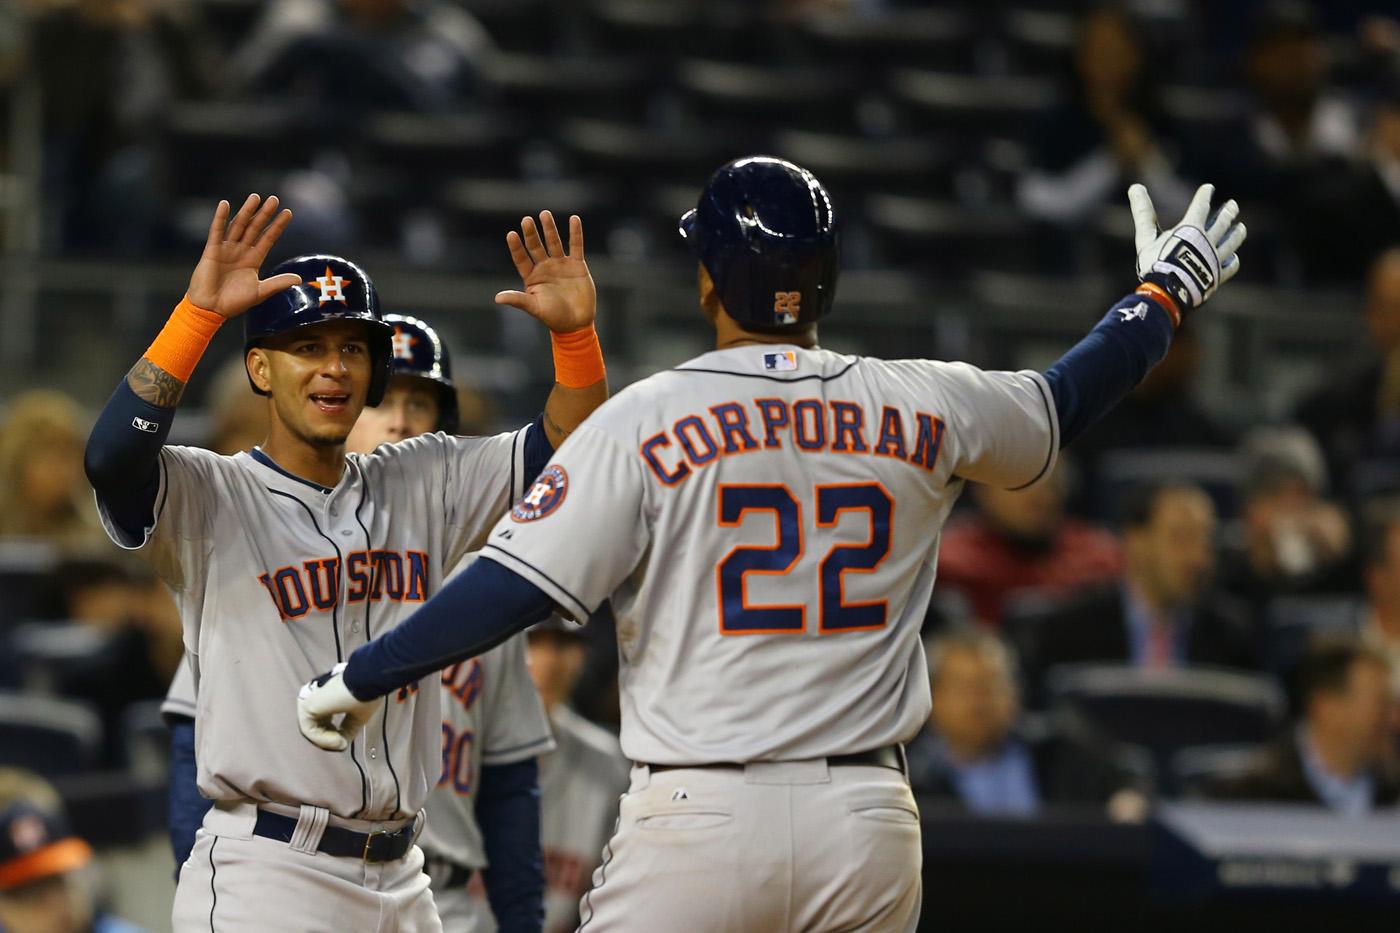 MLB_Astros_Yankees_April29_Astros.jpg